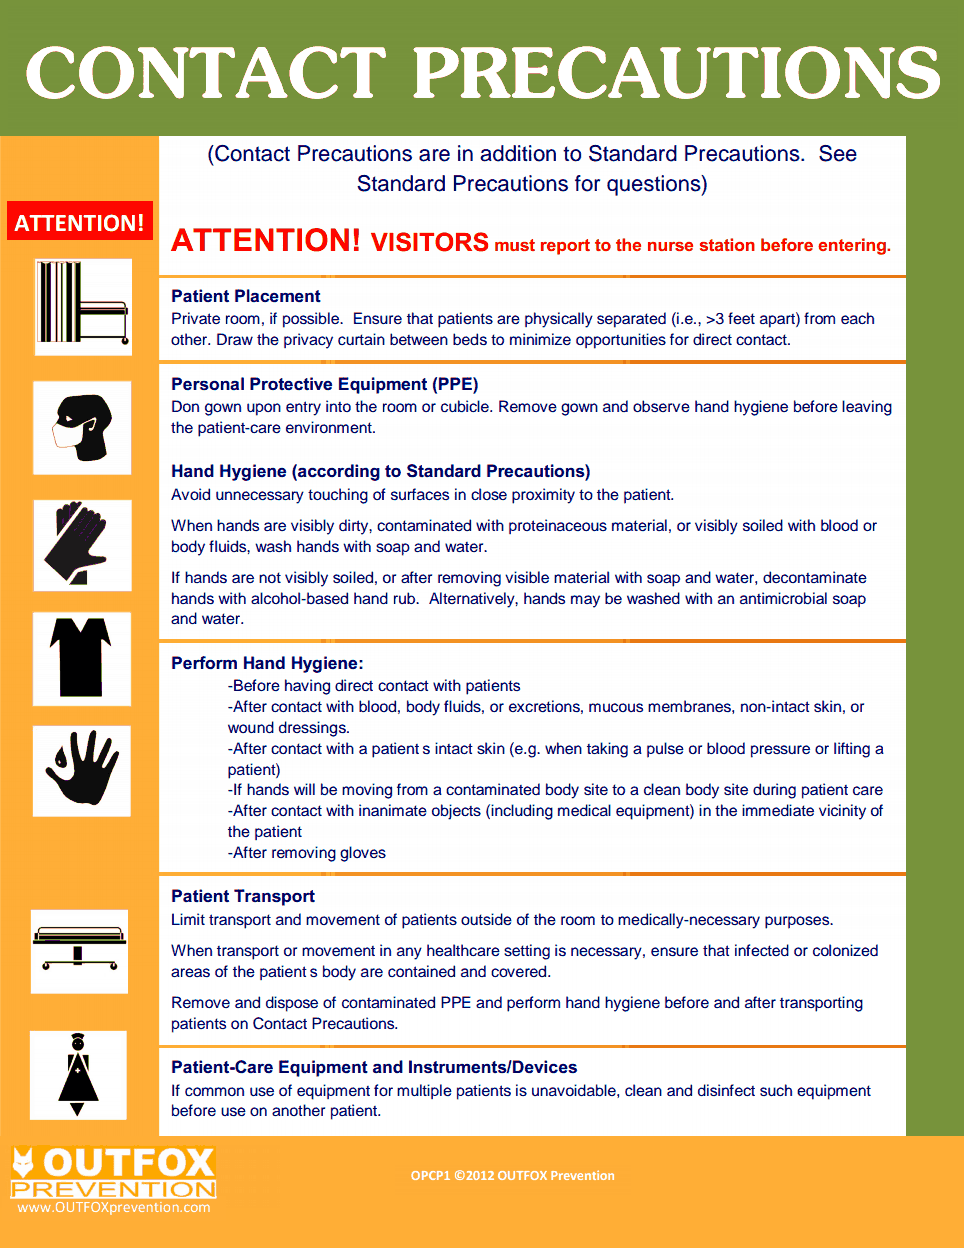 OUTFOX CDC Contact Precautions.pdf | X-Ray...totally RAD ...